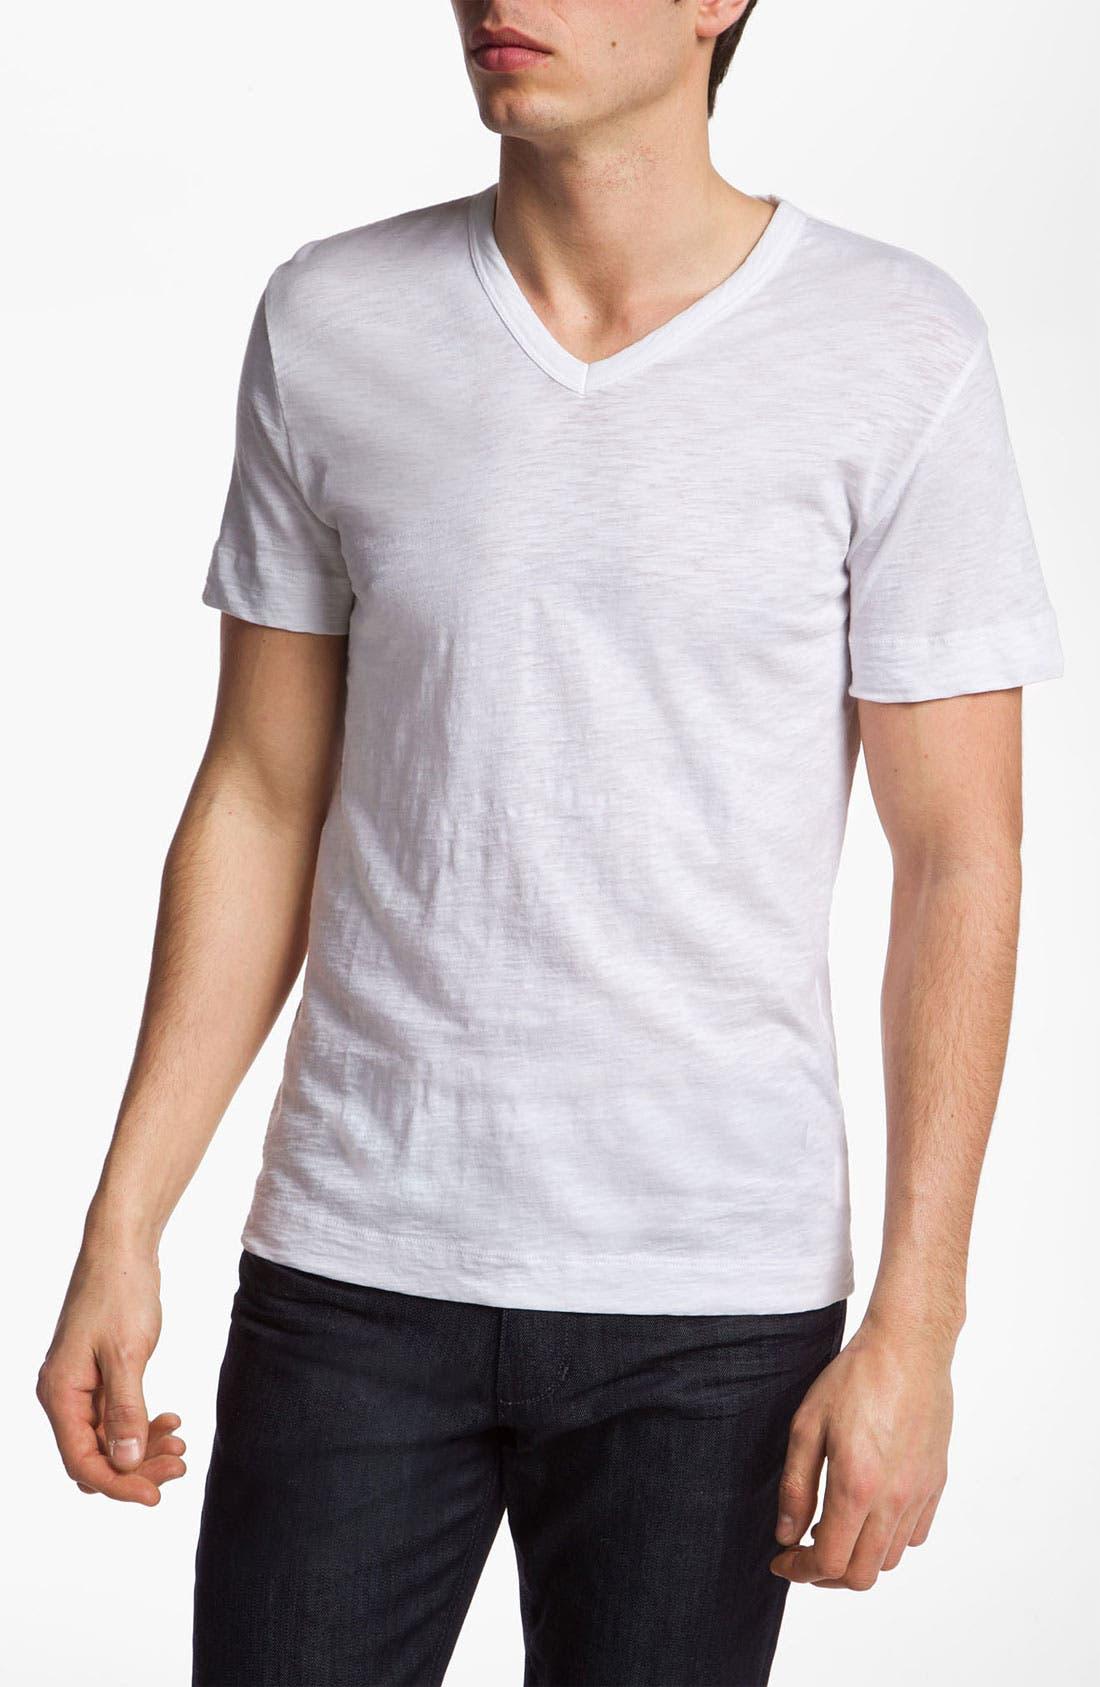 Alternate Image 1 Selected - Theory V-Neck T-Shirt